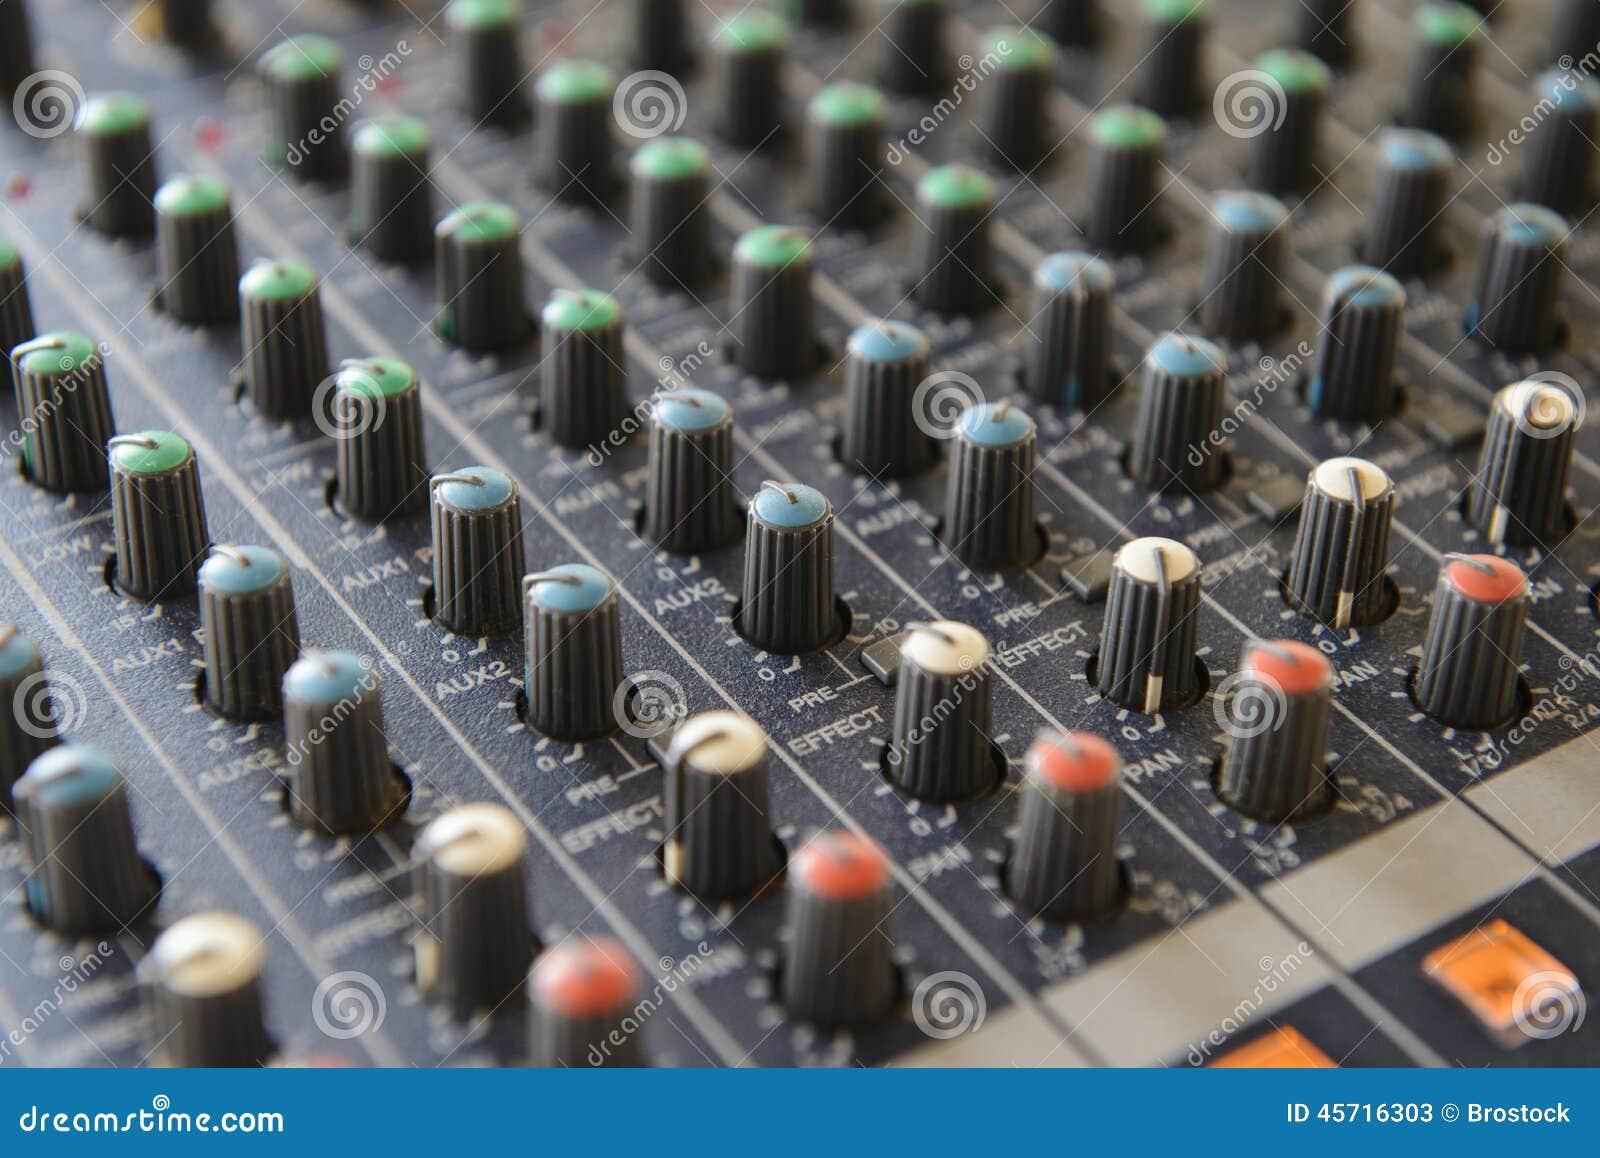 part sound board mixer stock image image of dance jockey 45716303. Black Bedroom Furniture Sets. Home Design Ideas